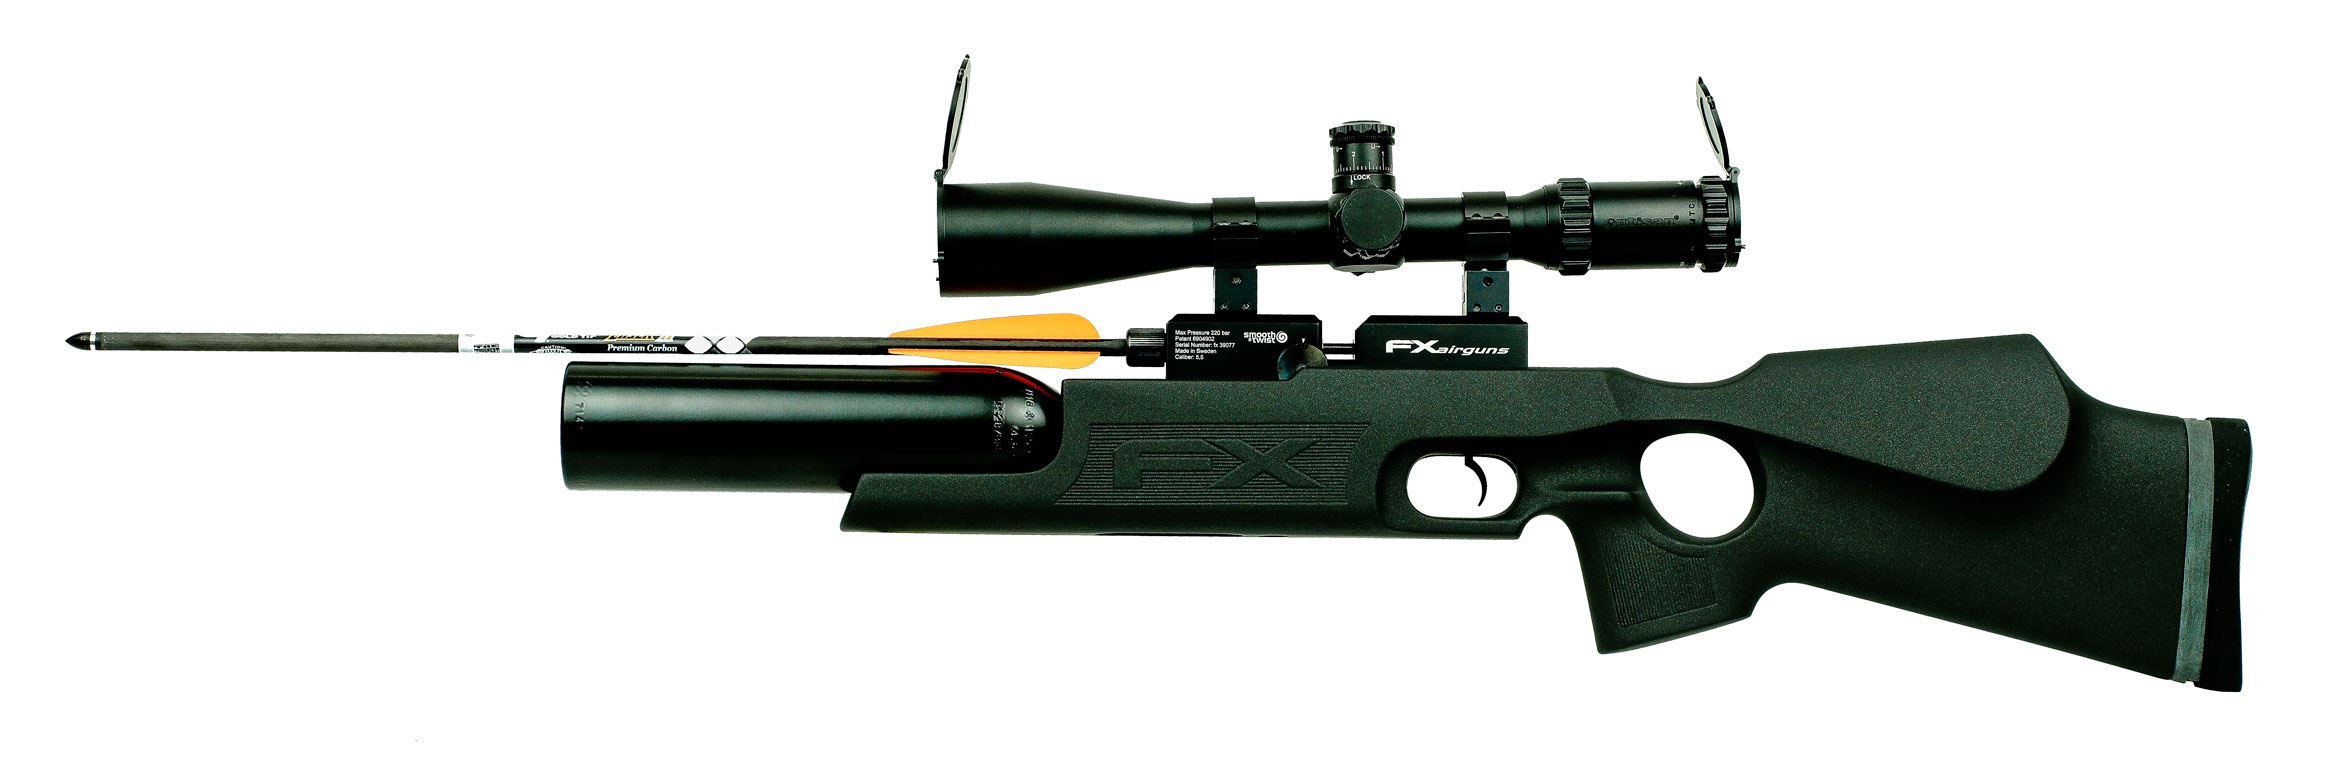 empolotez signature firearmsfx royale 400 arrow syntetic pcp air rifle